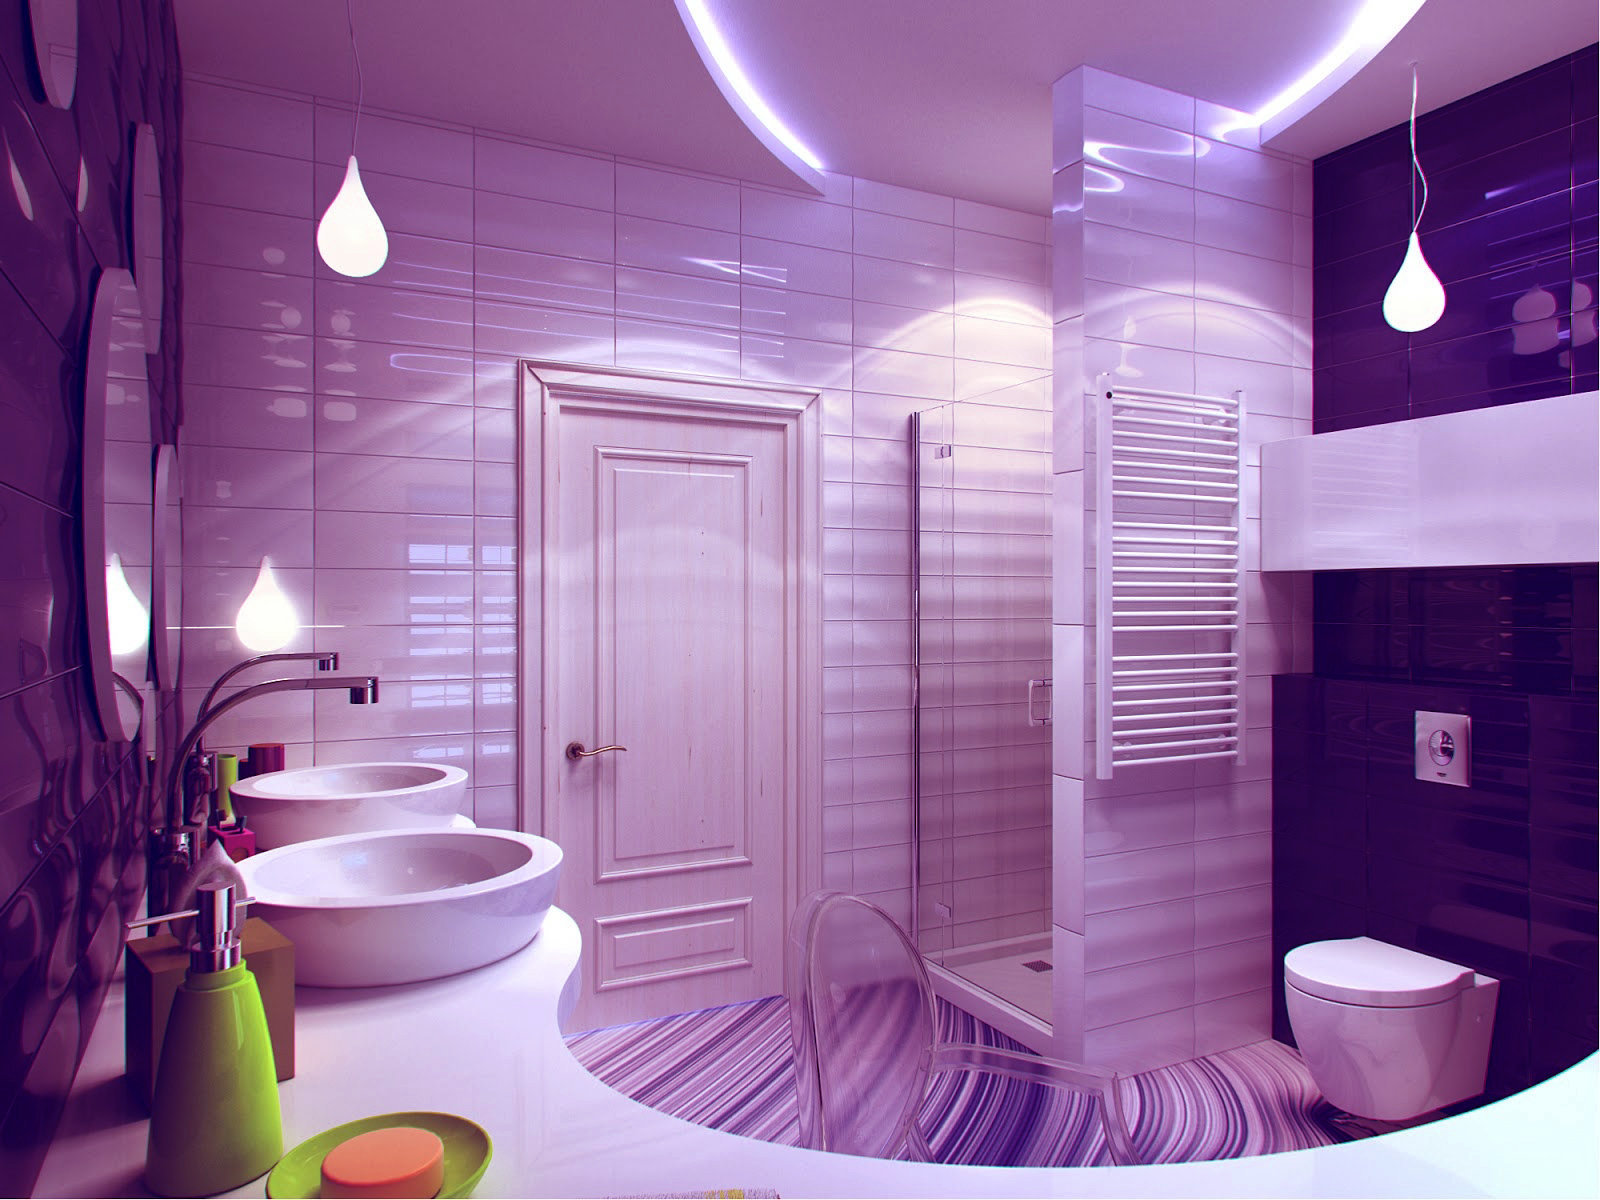 صورة اطقم حمامات